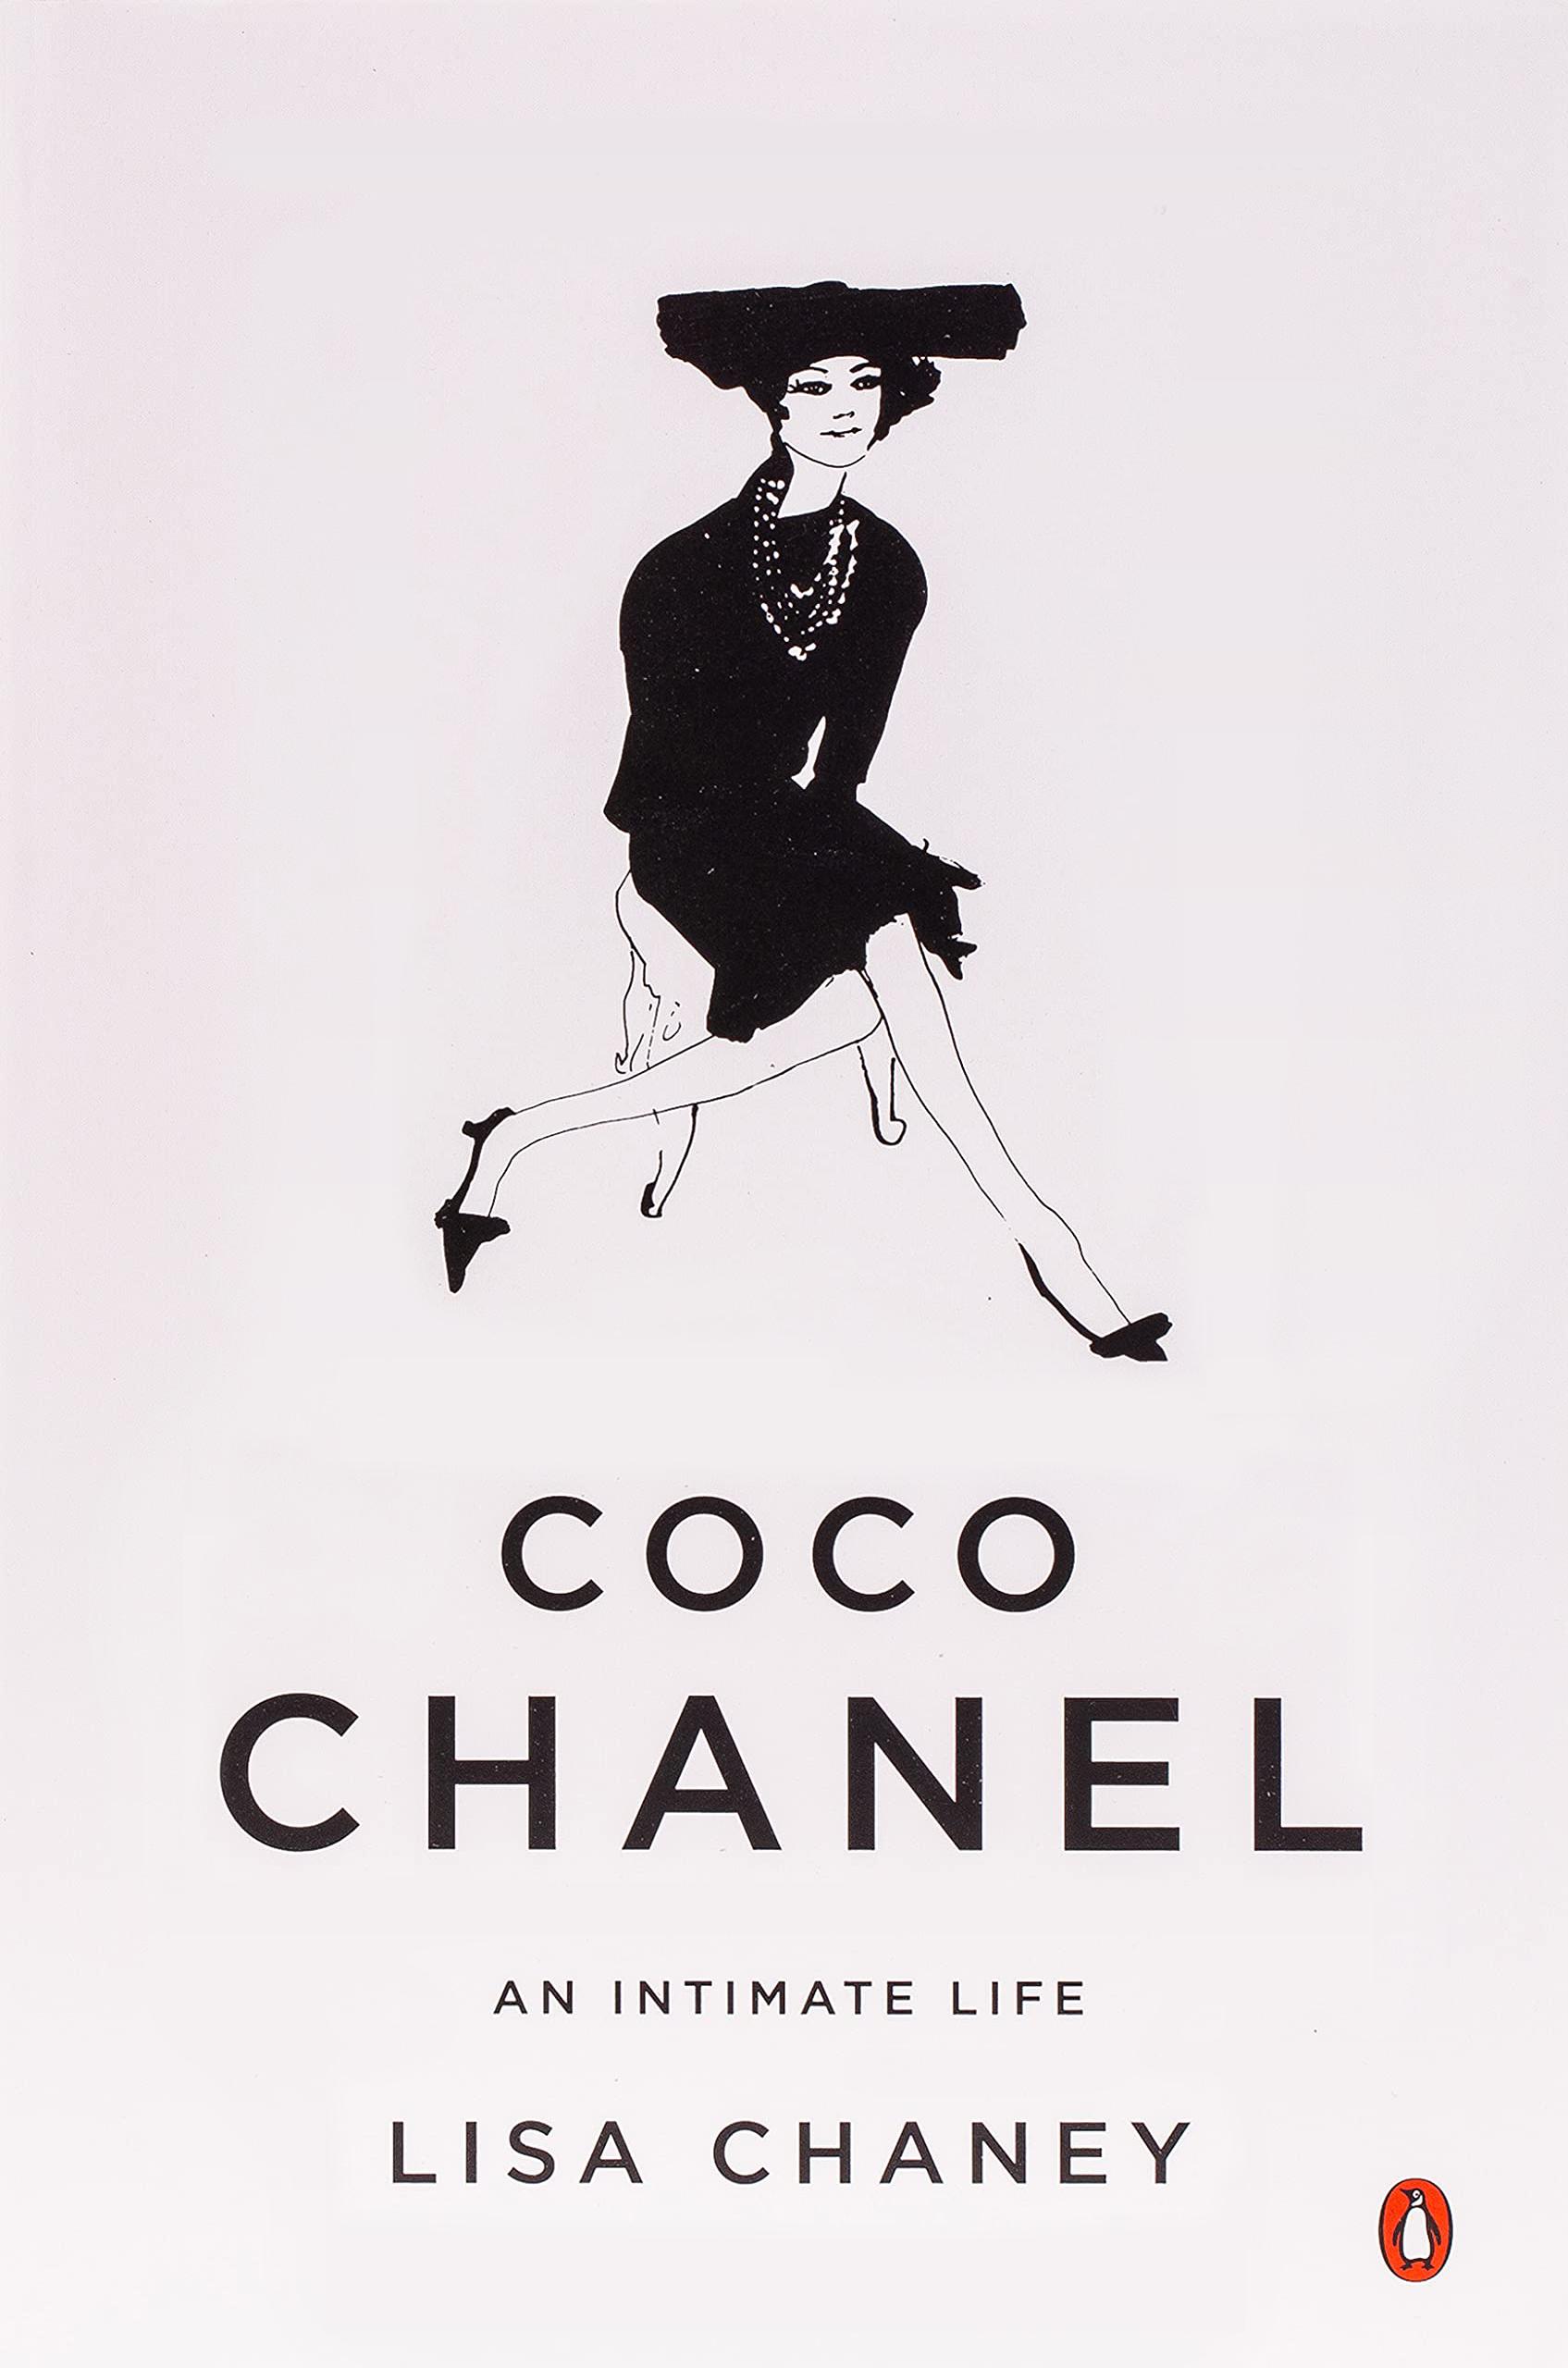 sách tiểu sử Coco Chanel: An Intimate Life